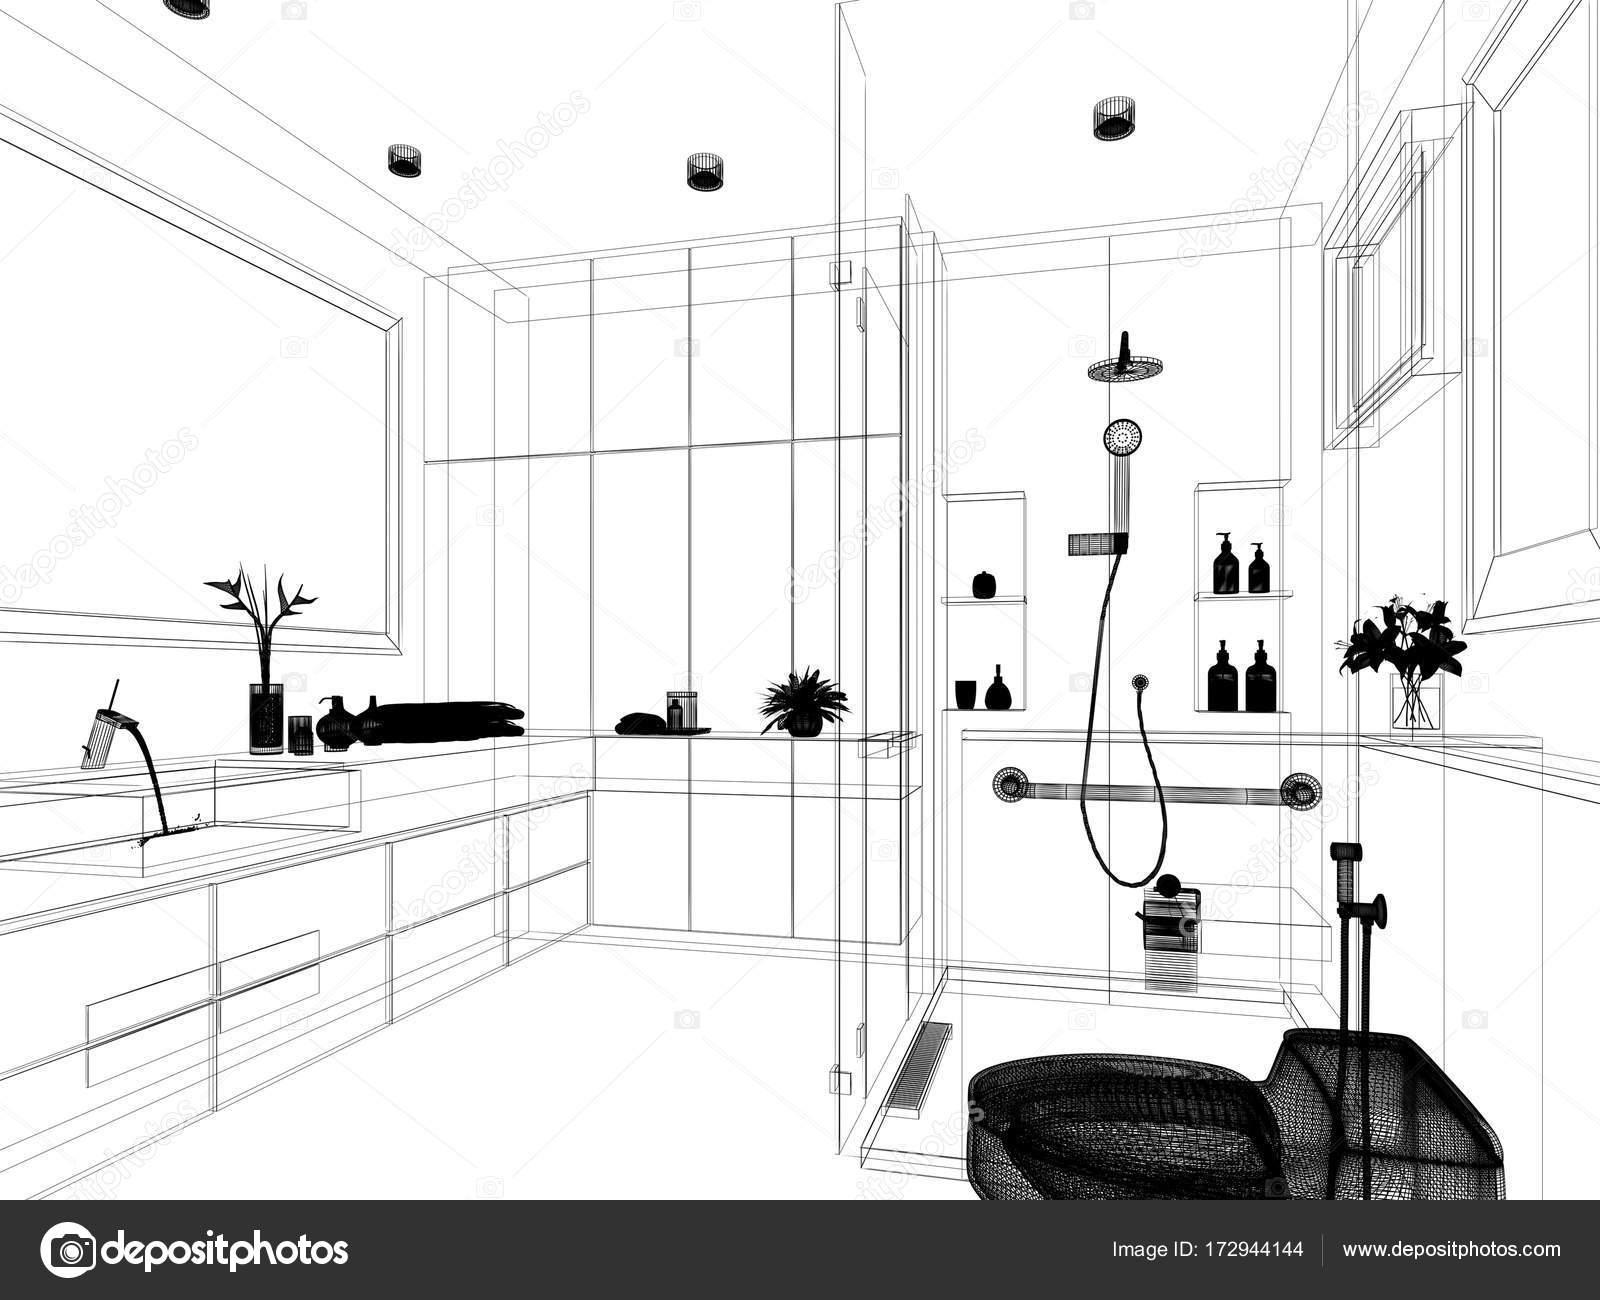 Abstract Sketch Design Of Interior Bathroom 3d Rendering Stock Photo C Yaryhee 172944144